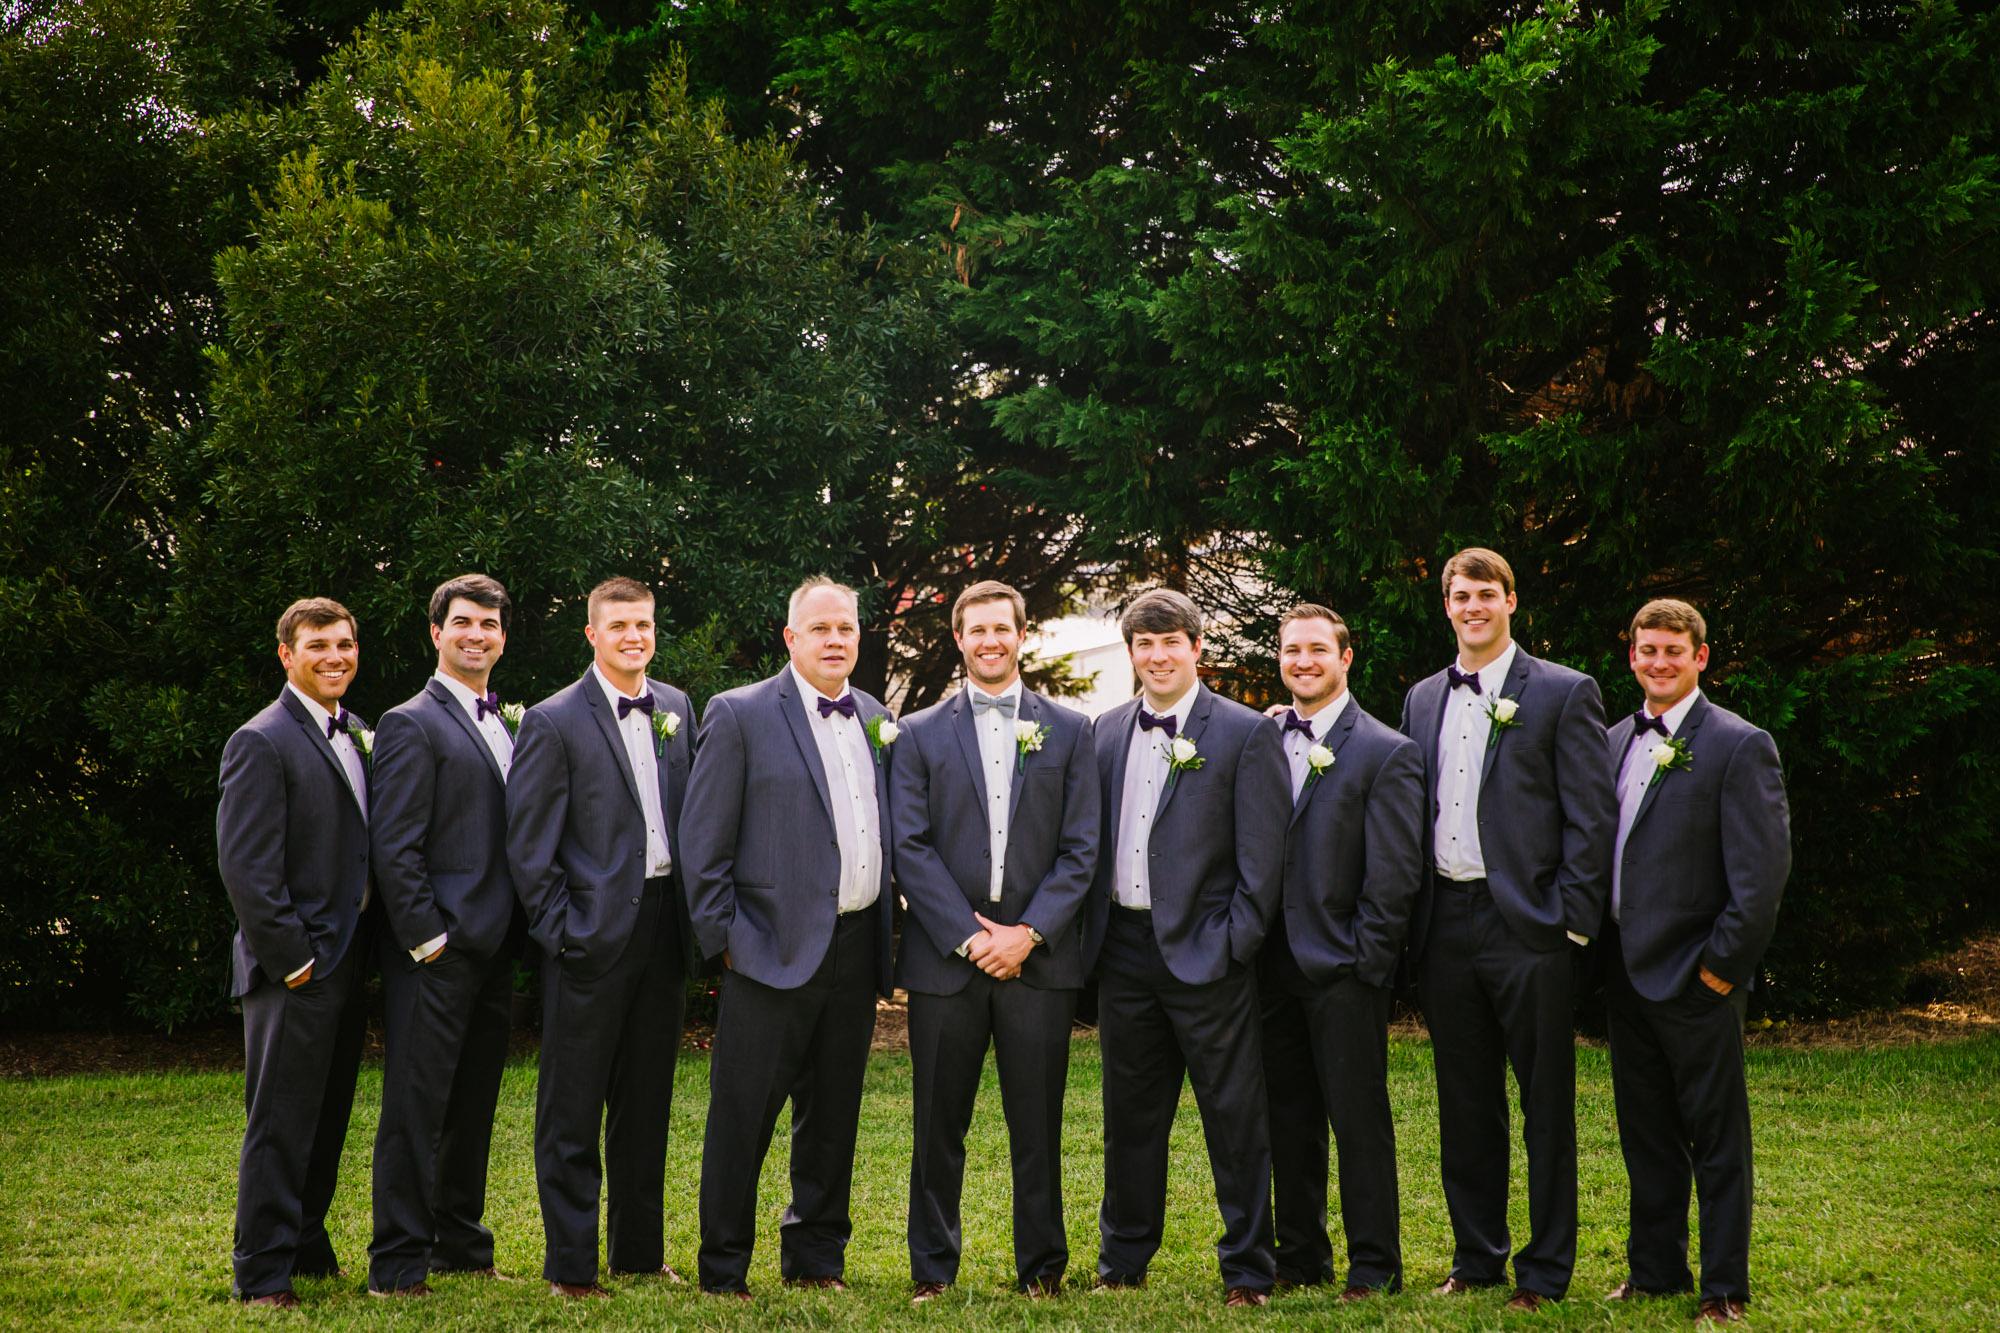 Waynesville, NC Wedding Photography | Groomsmen Portrait